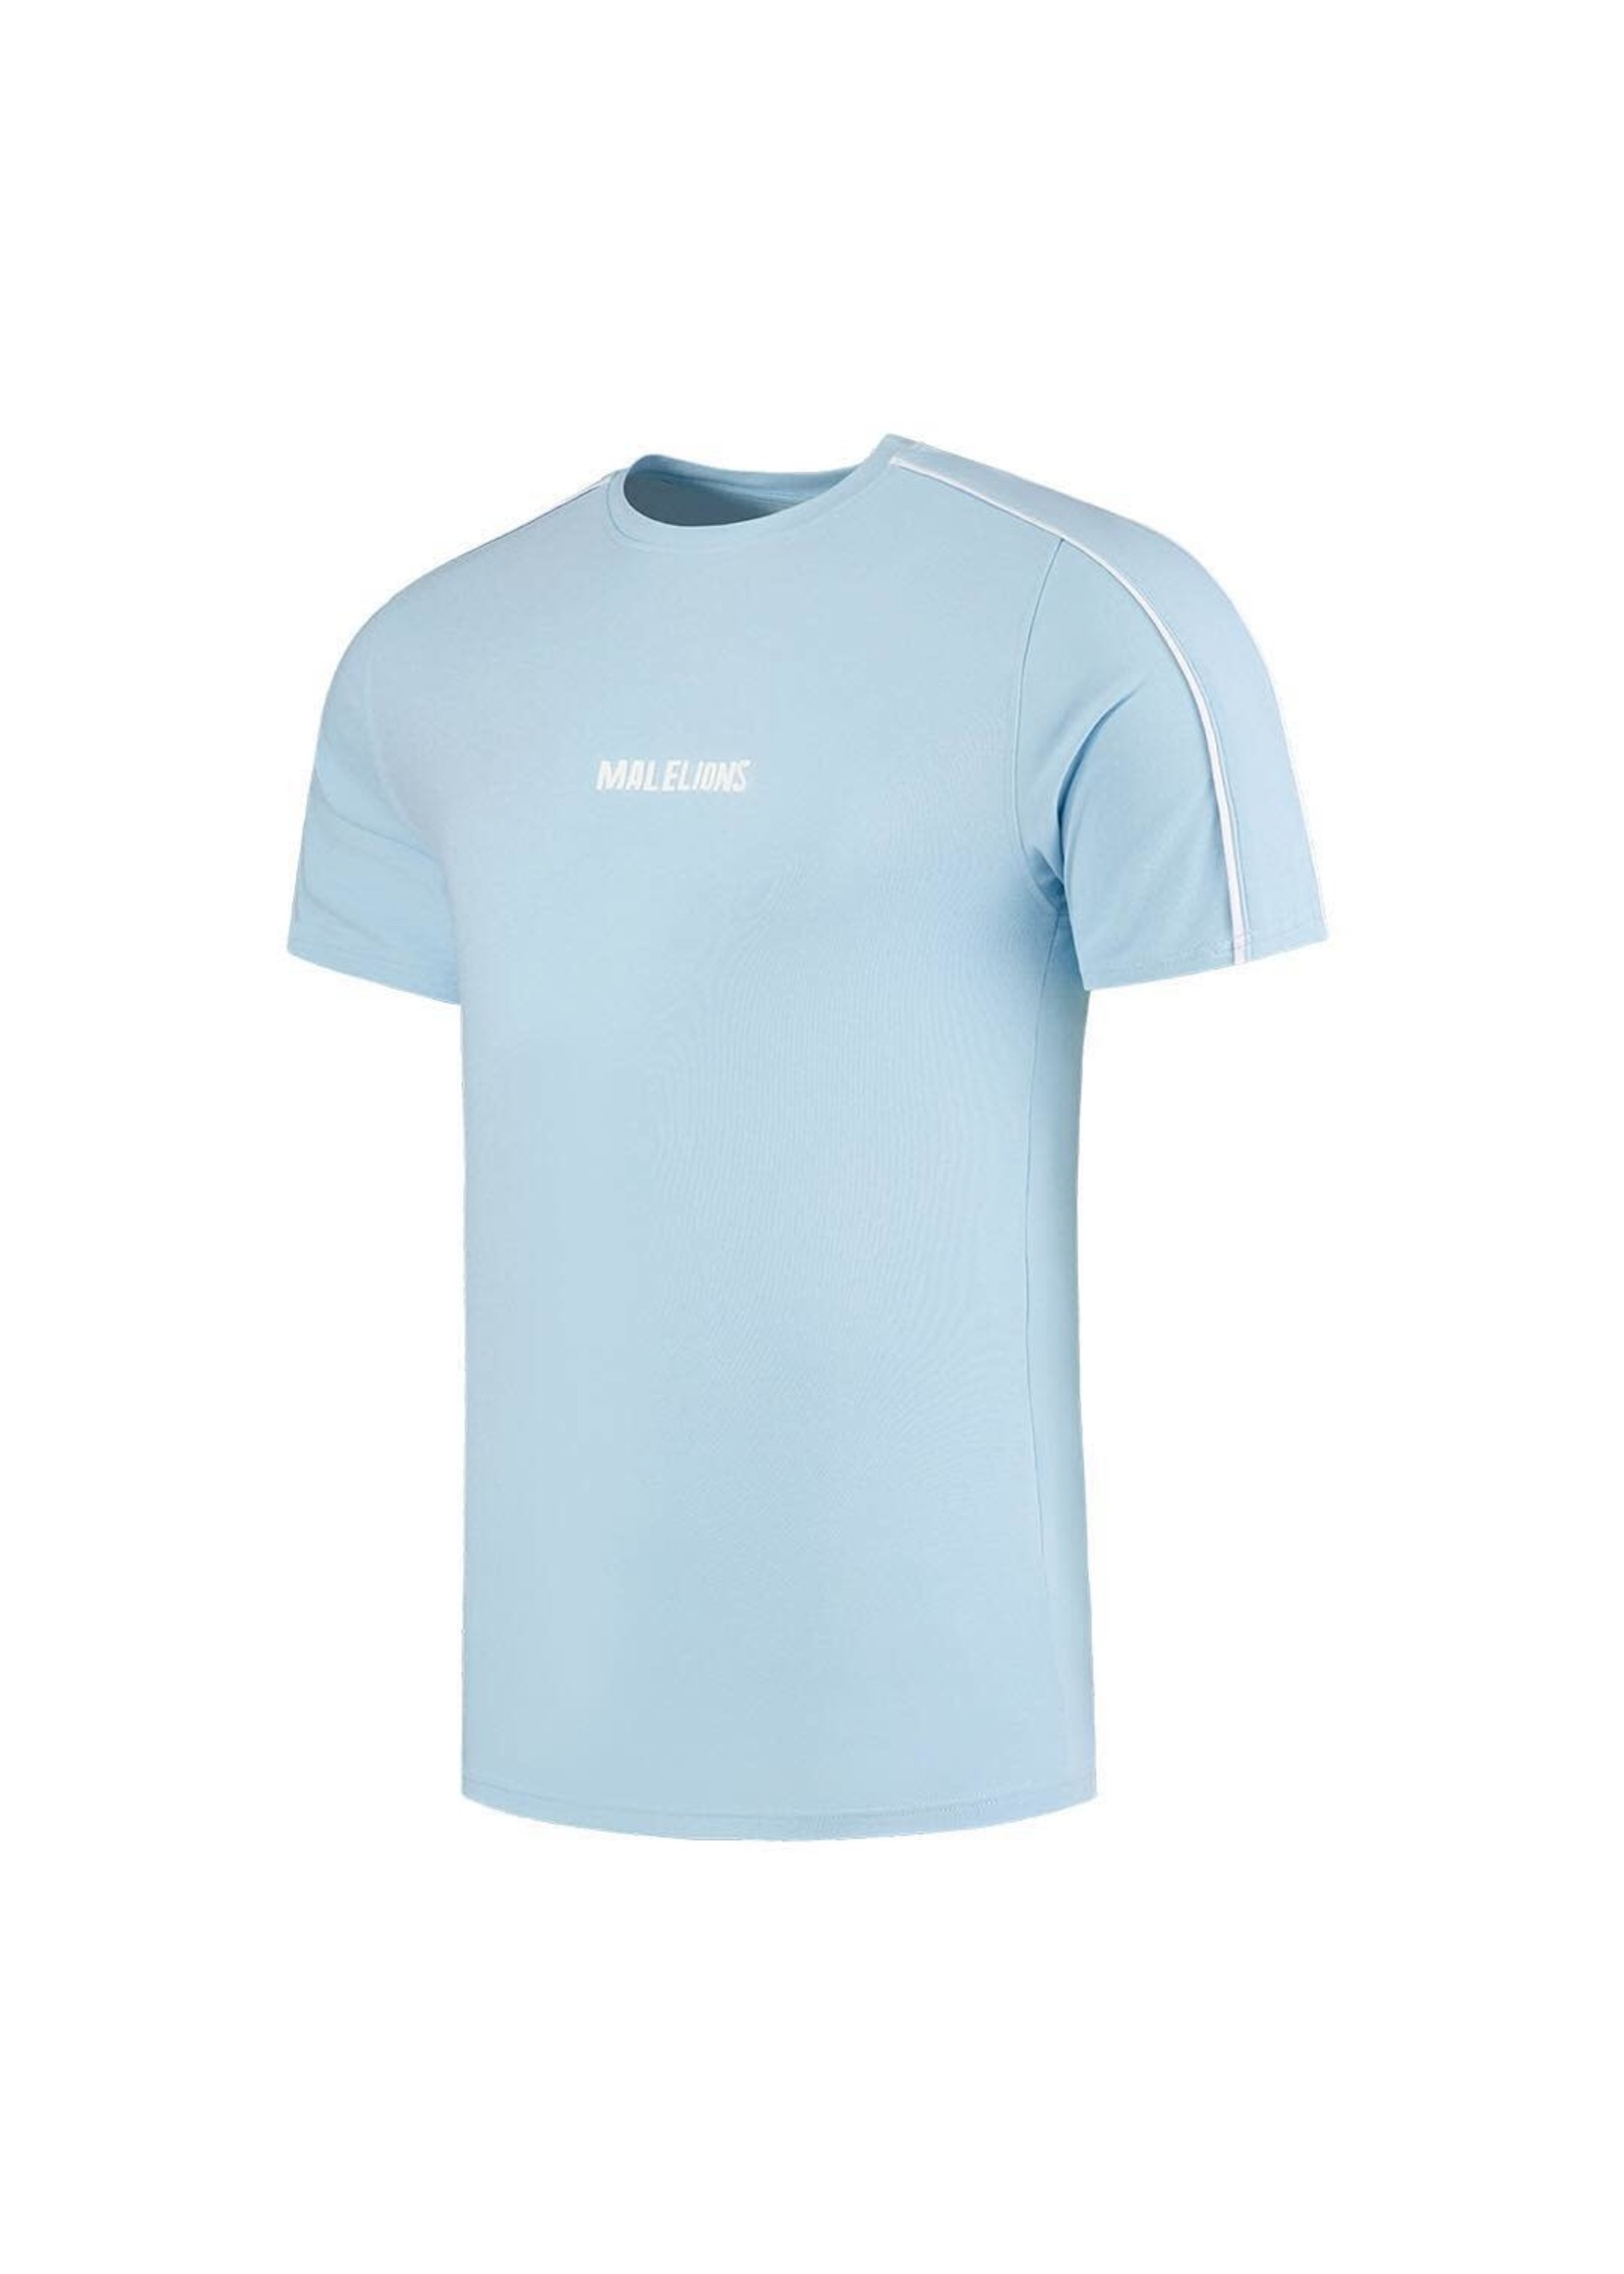 Malelions Malelions Junior Thies T-Shirt - Light Blue